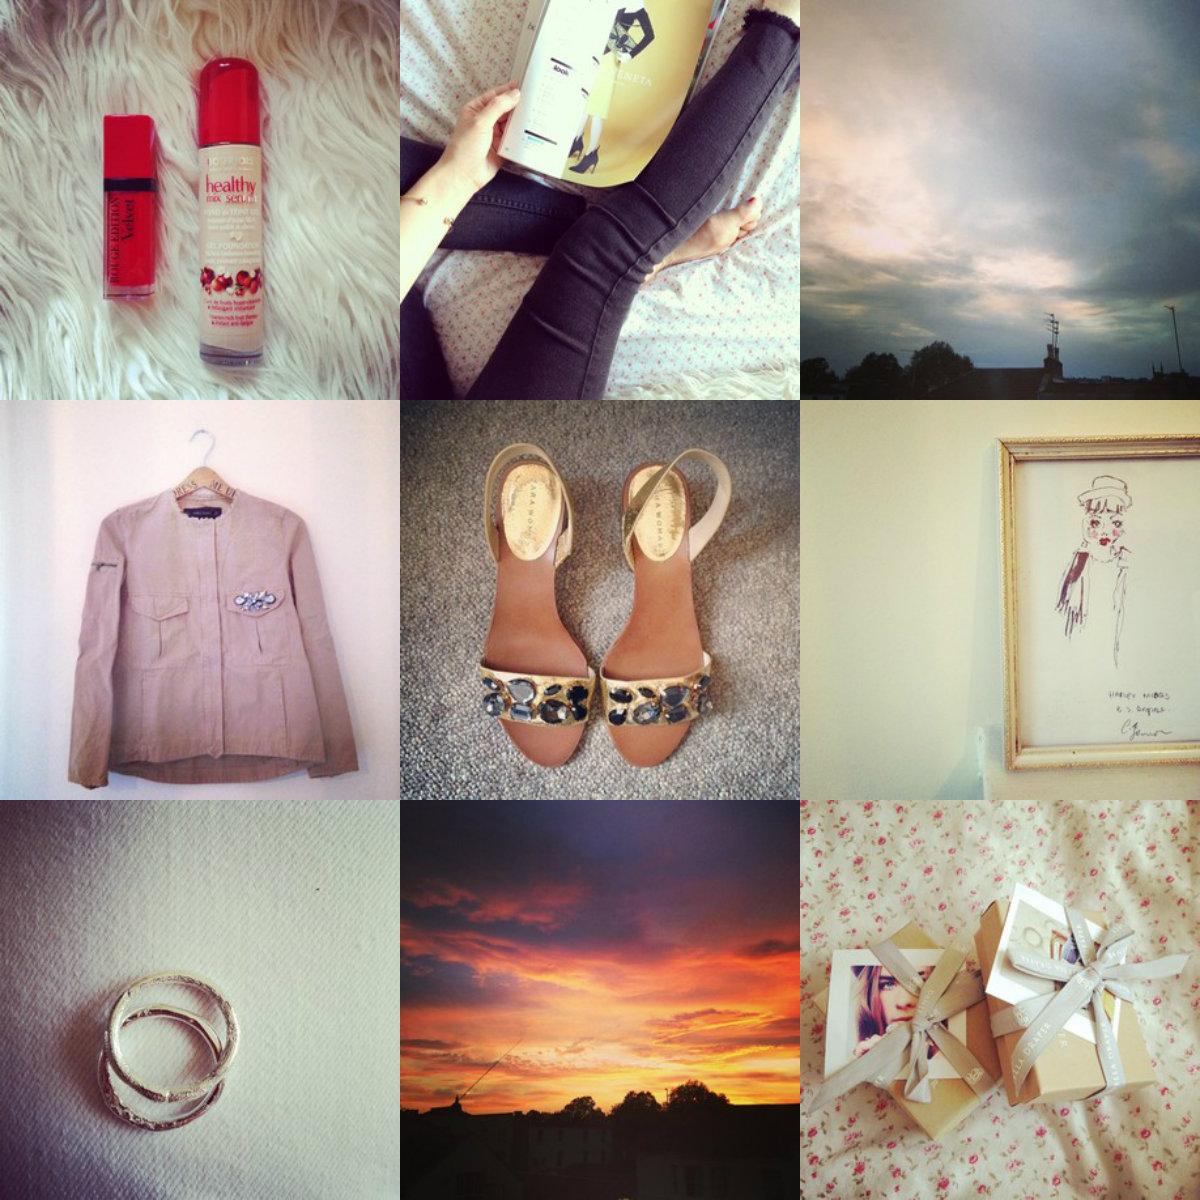 instagram, zara, daniella draper, sunset, sky, insta